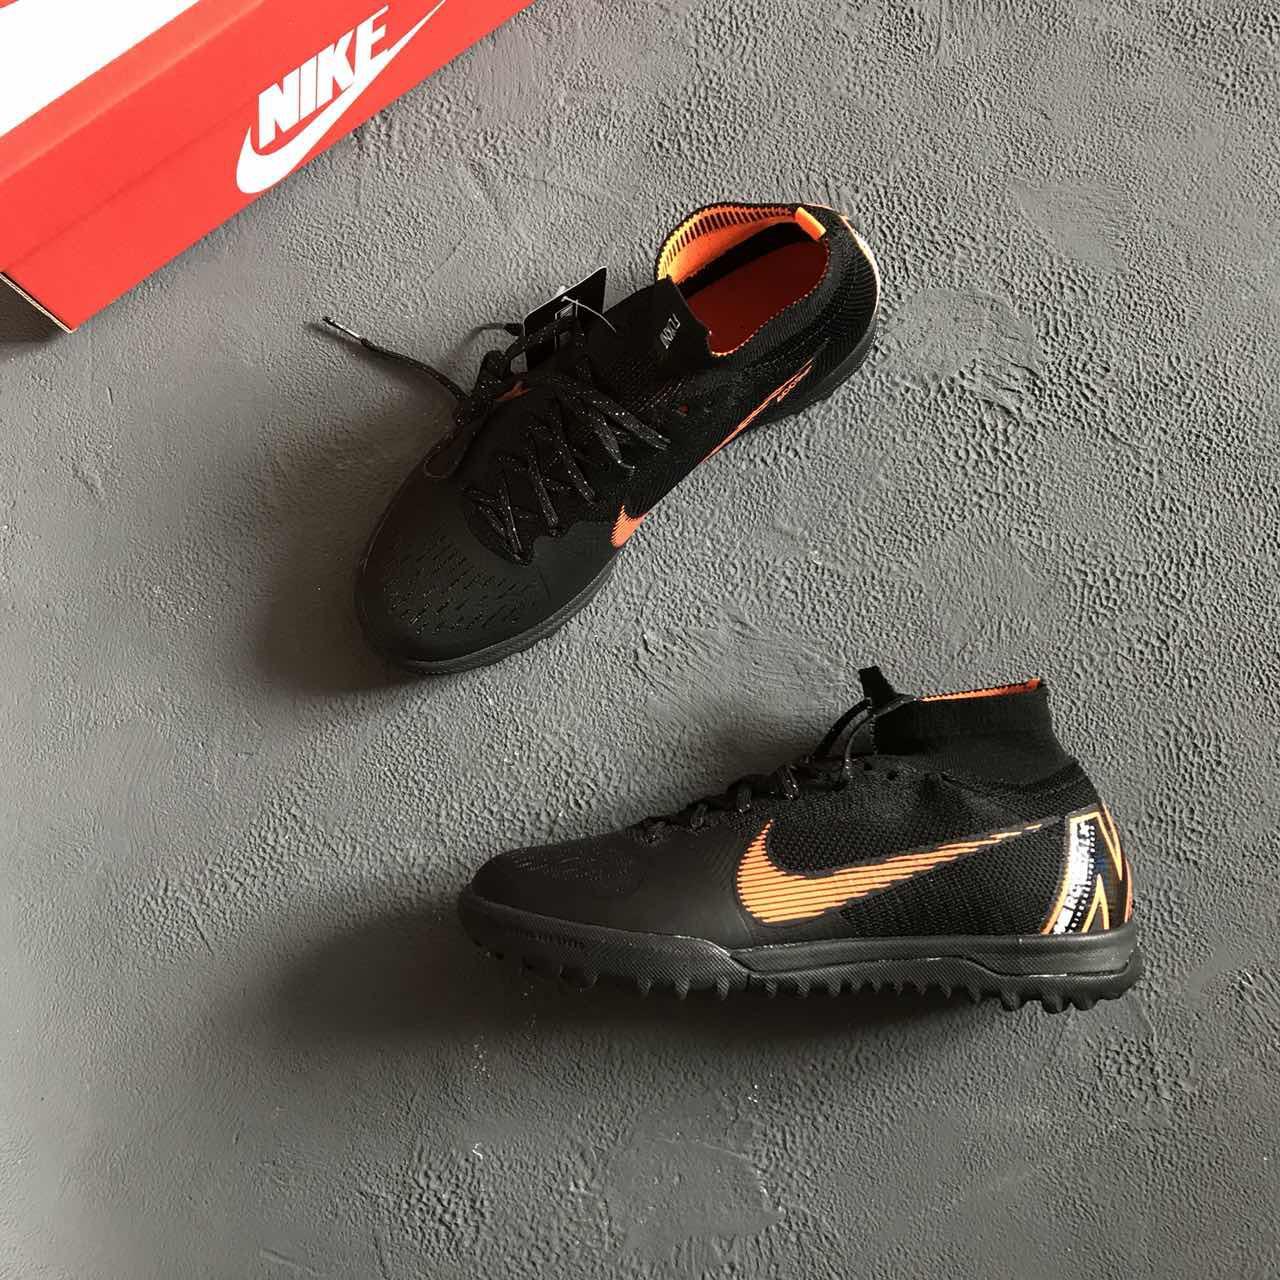 35ea32bf Купить Сороконожки Nike Mercurial 360 в Киеве от